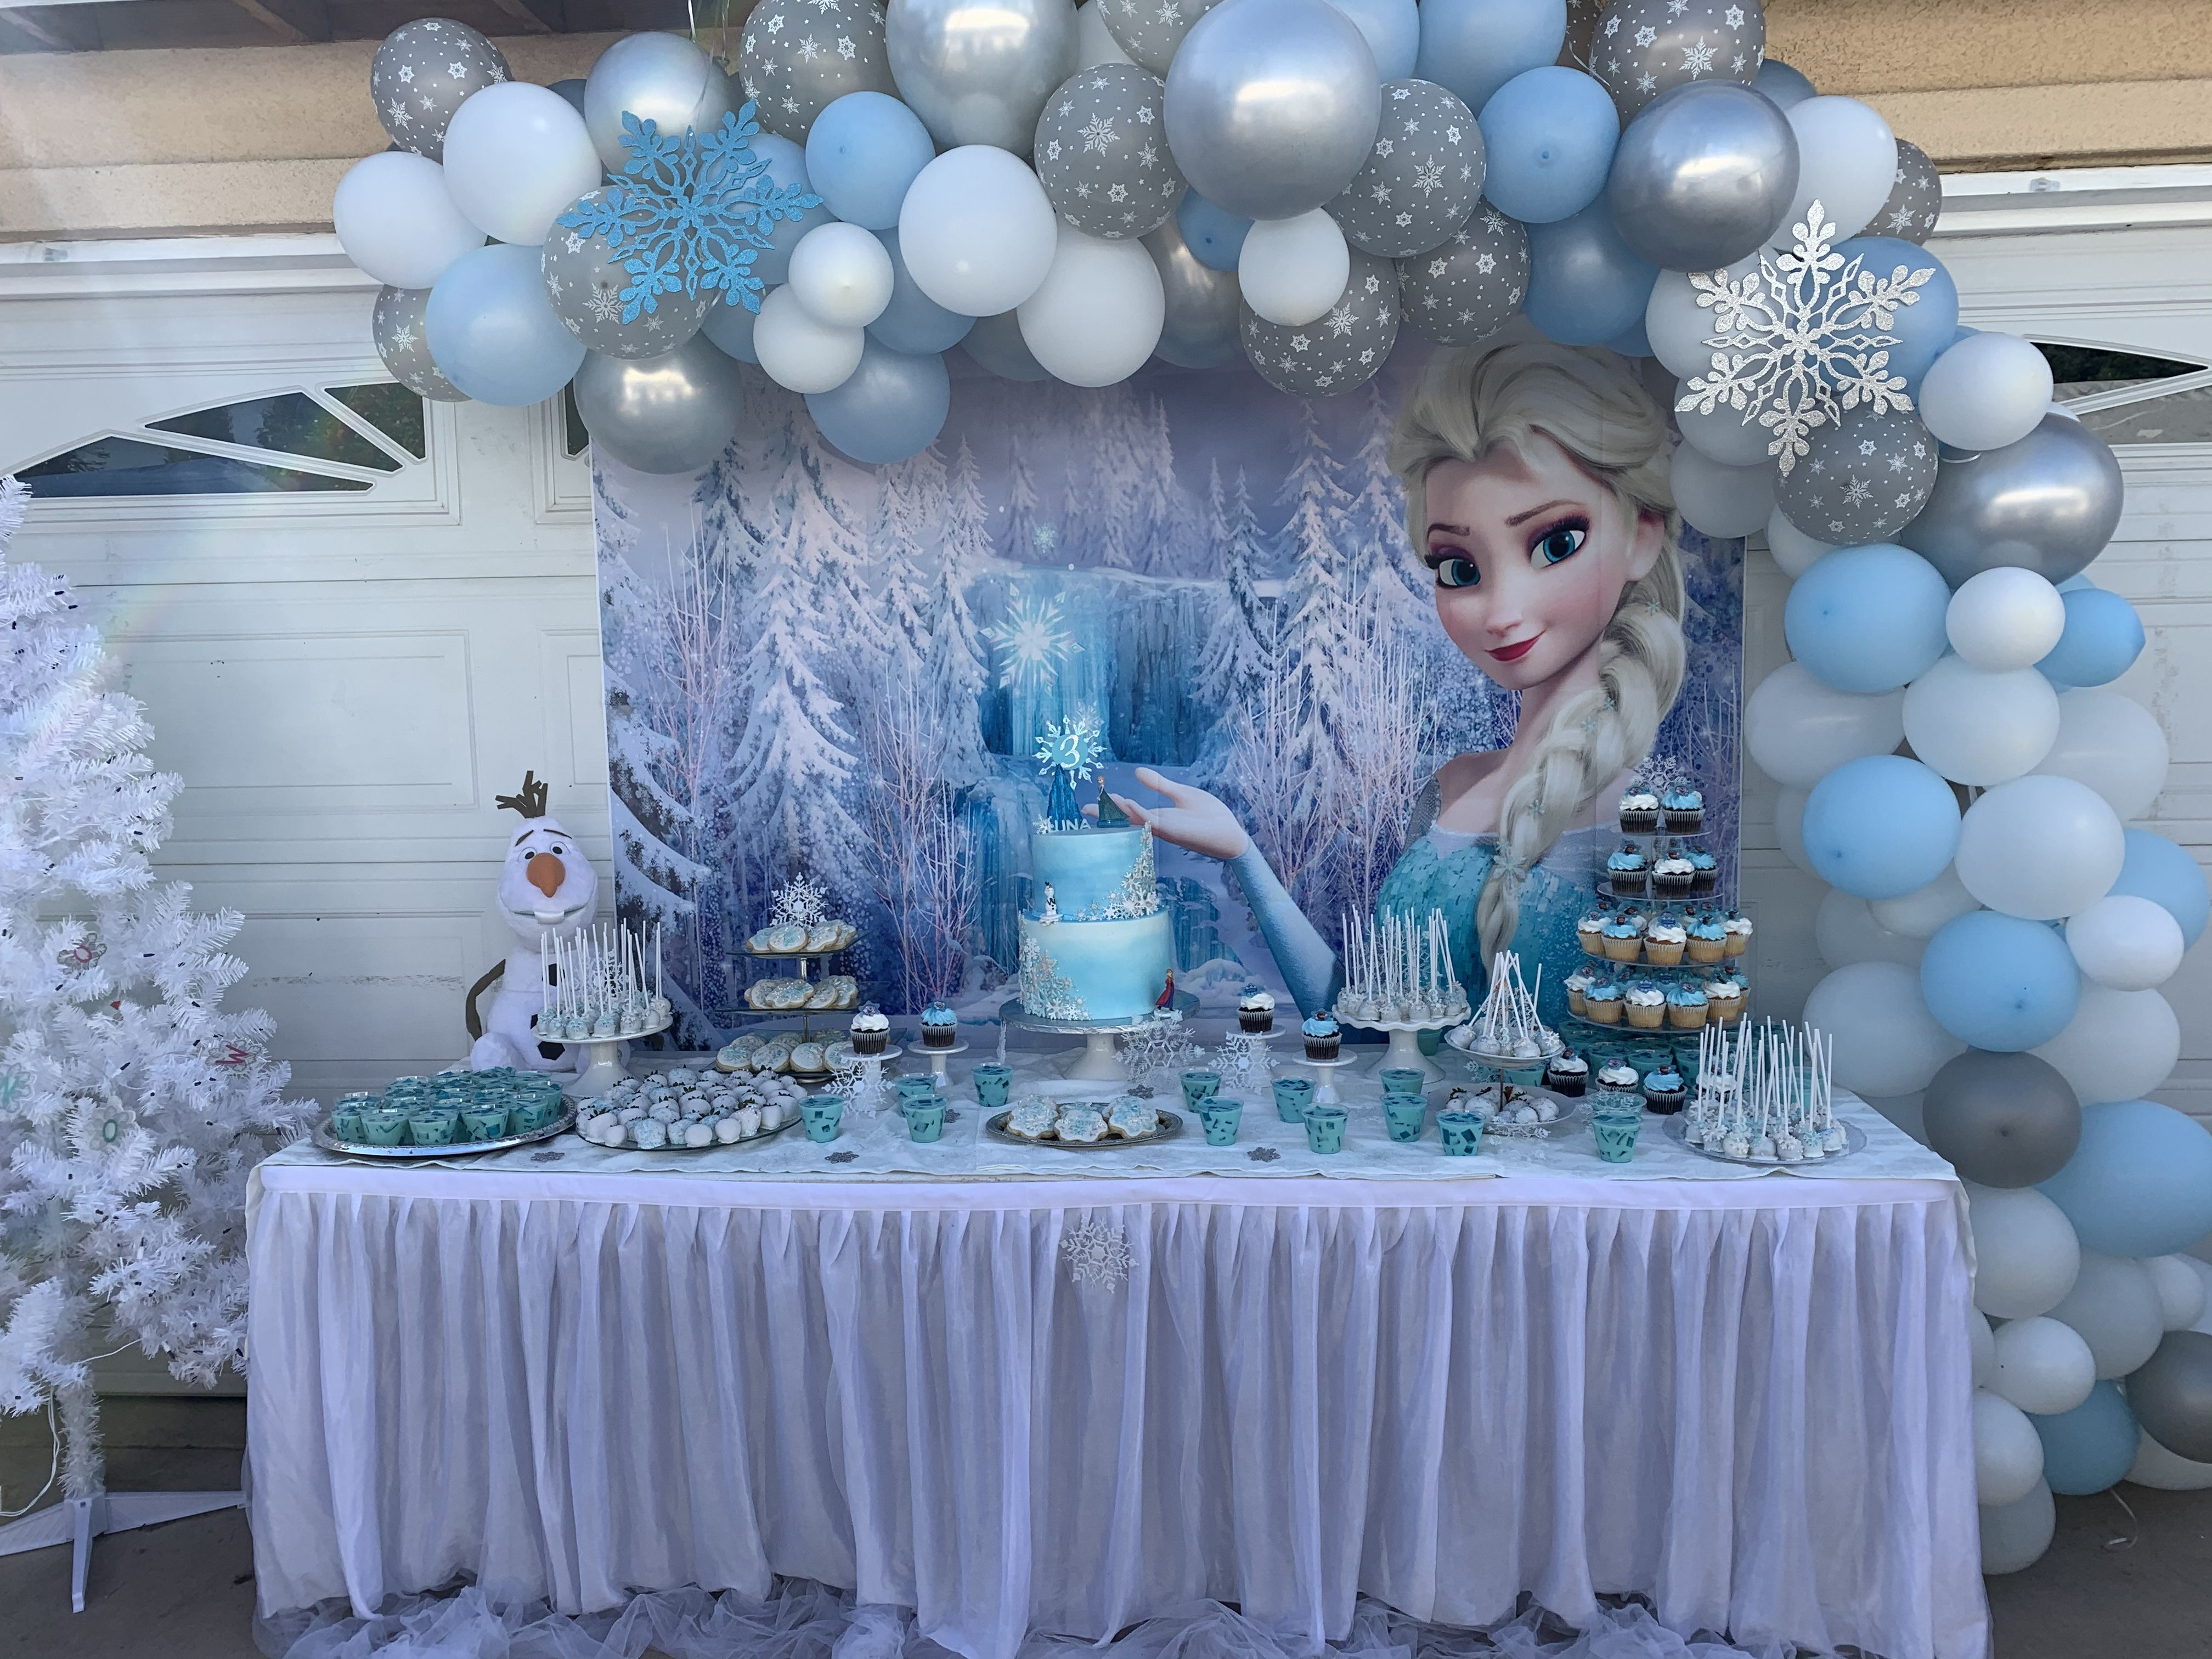 Frozen Birthday Frozen Themed Birthday Party Elsa Birthday Party Frozen Birthday Decorations